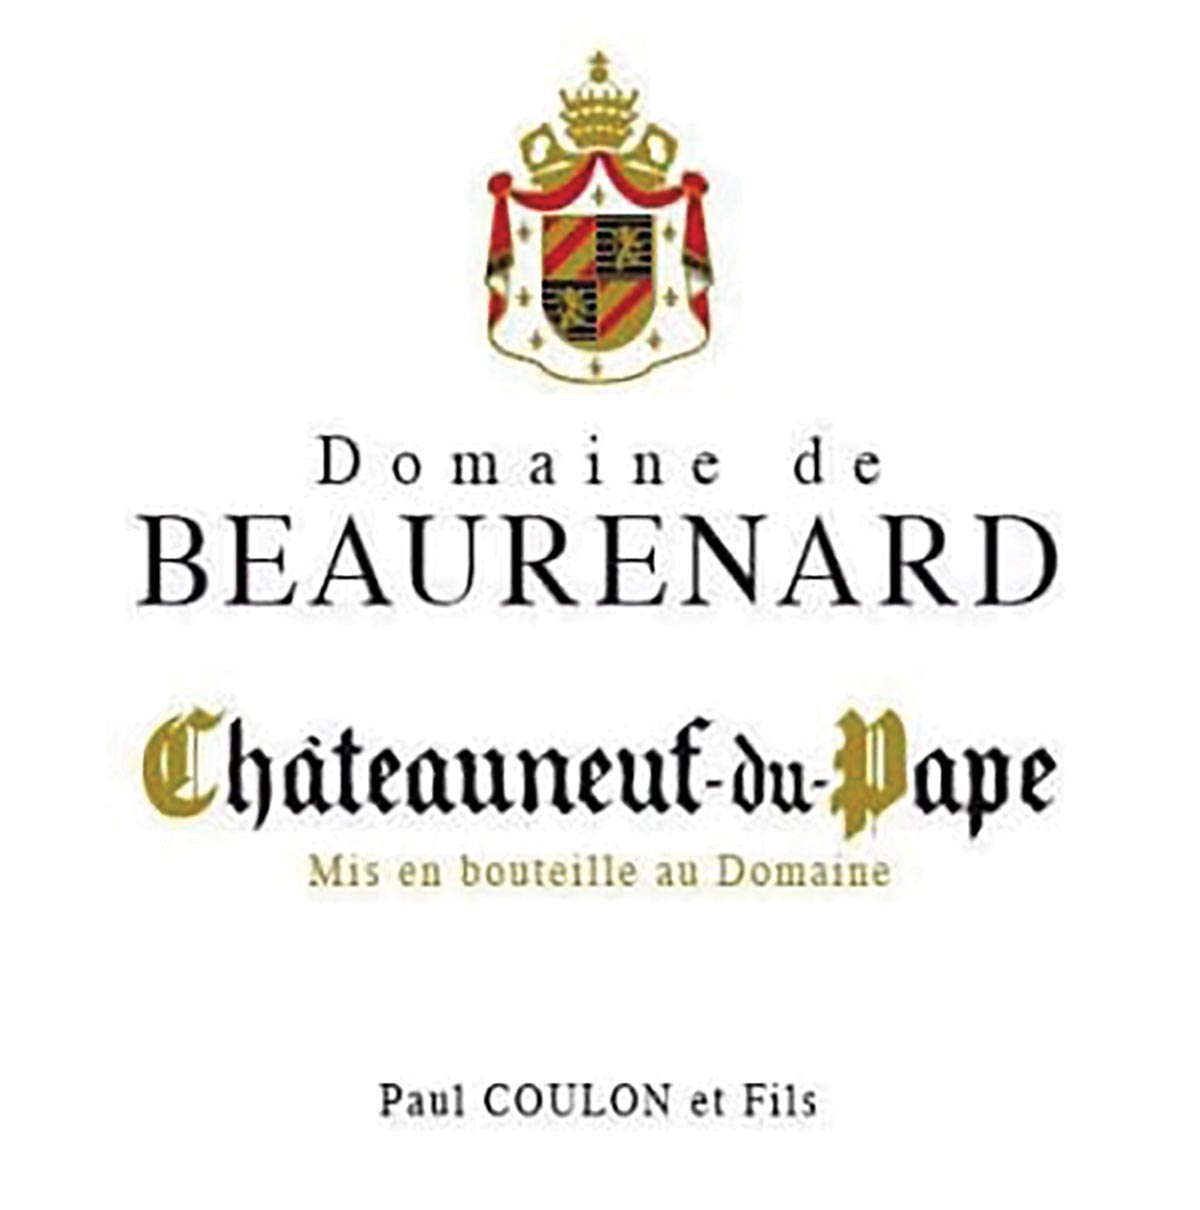 Wilson Daniels Adds Châteauneuf-du-Pape Estate Domaine de Beaurenard